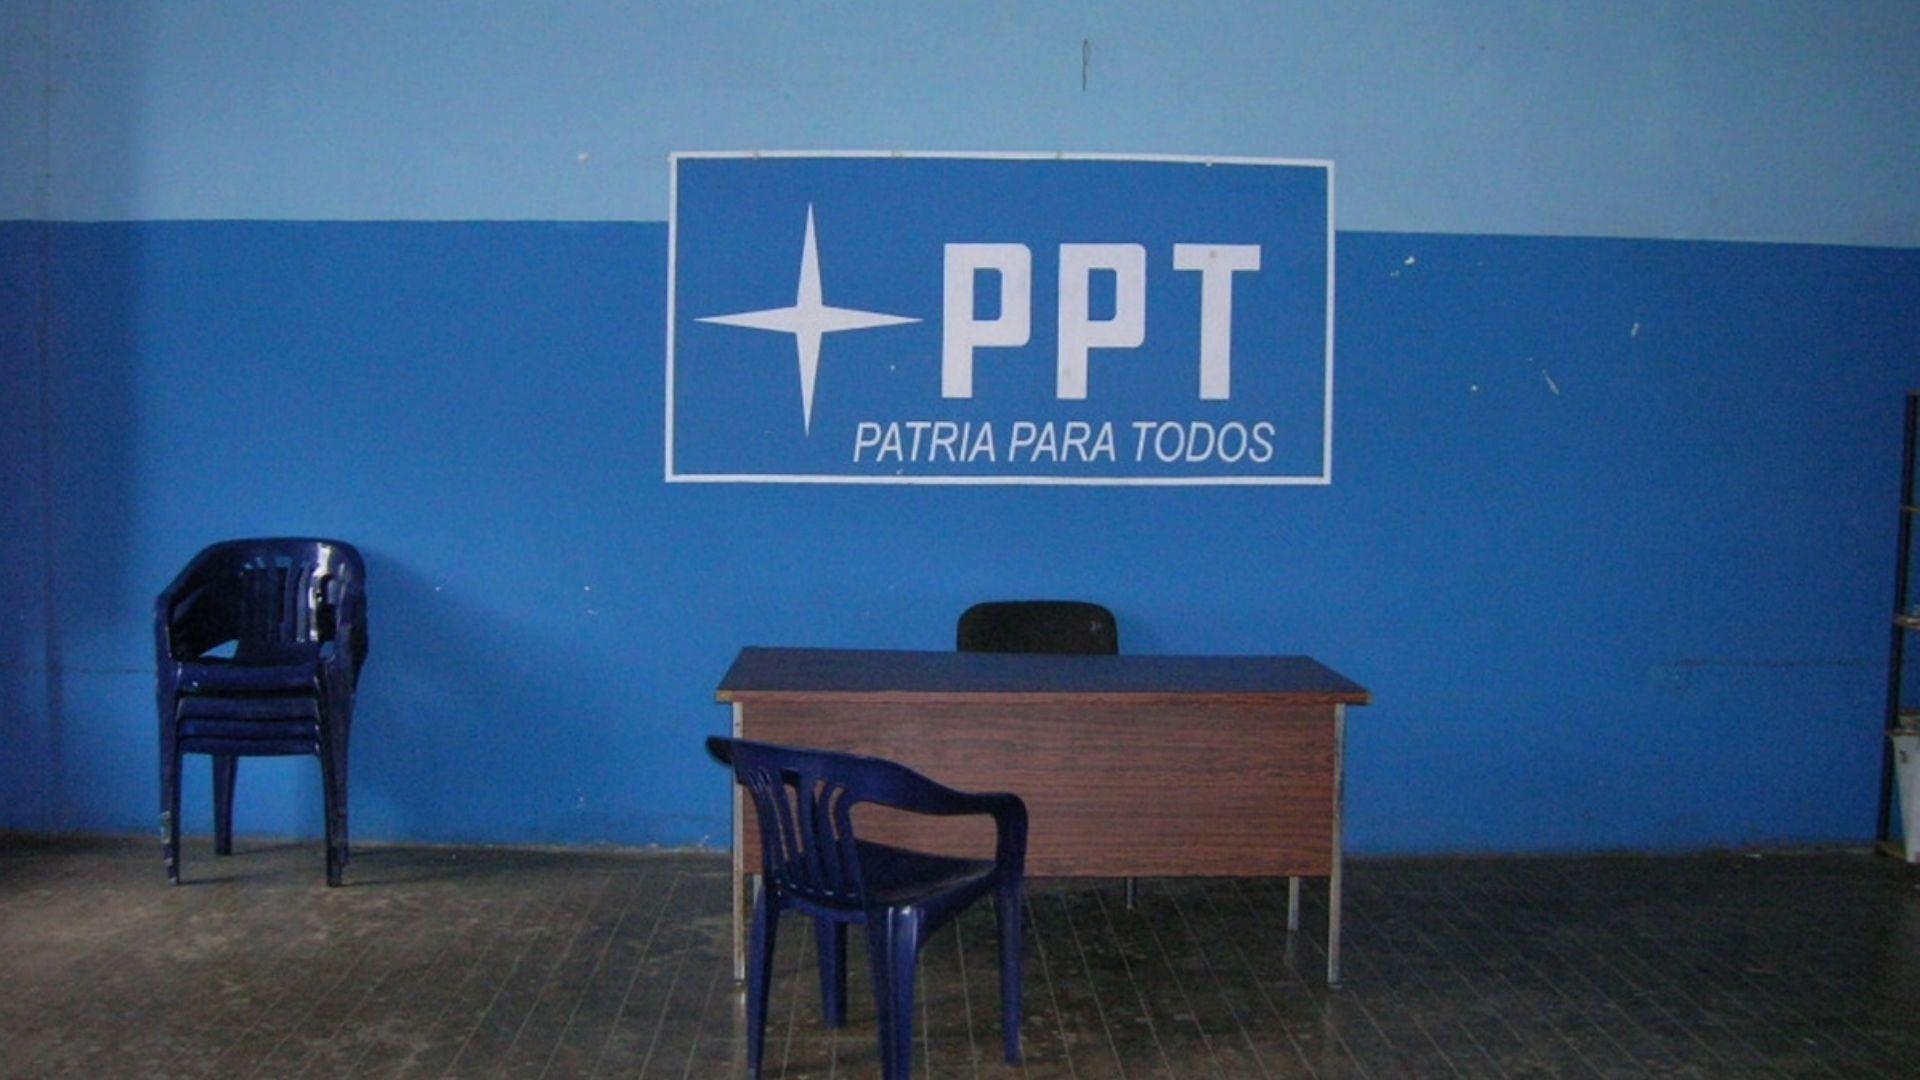 TSJ ordena al PPT entregar sedes a la junta ad hoc de Ilenia Medina